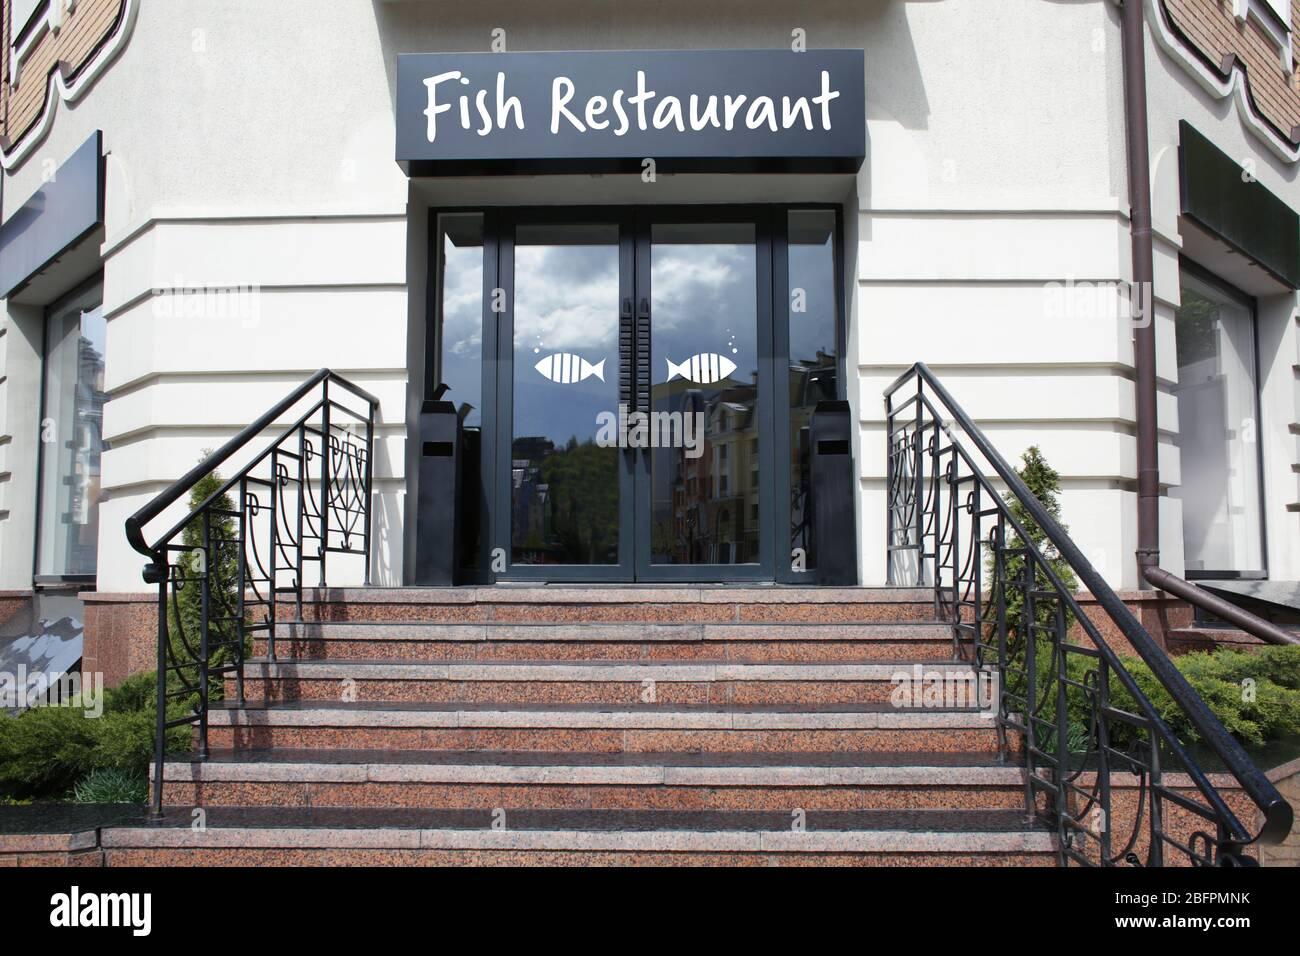 Modern Design Of Fish Restaurant Exterior Stock Photo Alamy